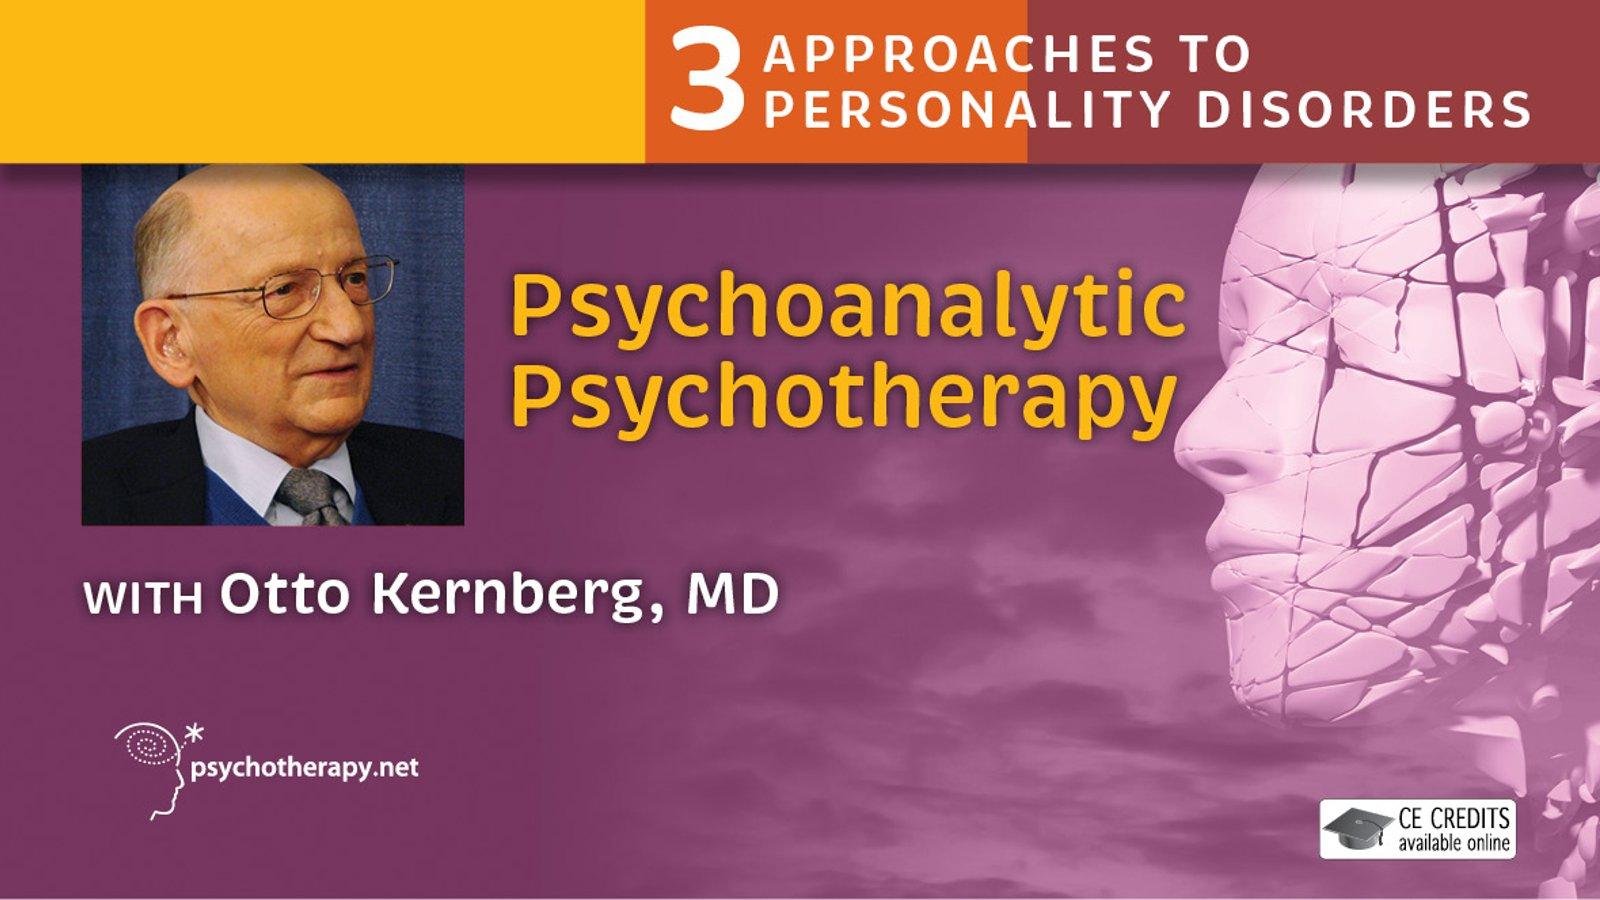 Psychoanalytic Psychotherapy - With Otto Kernberg